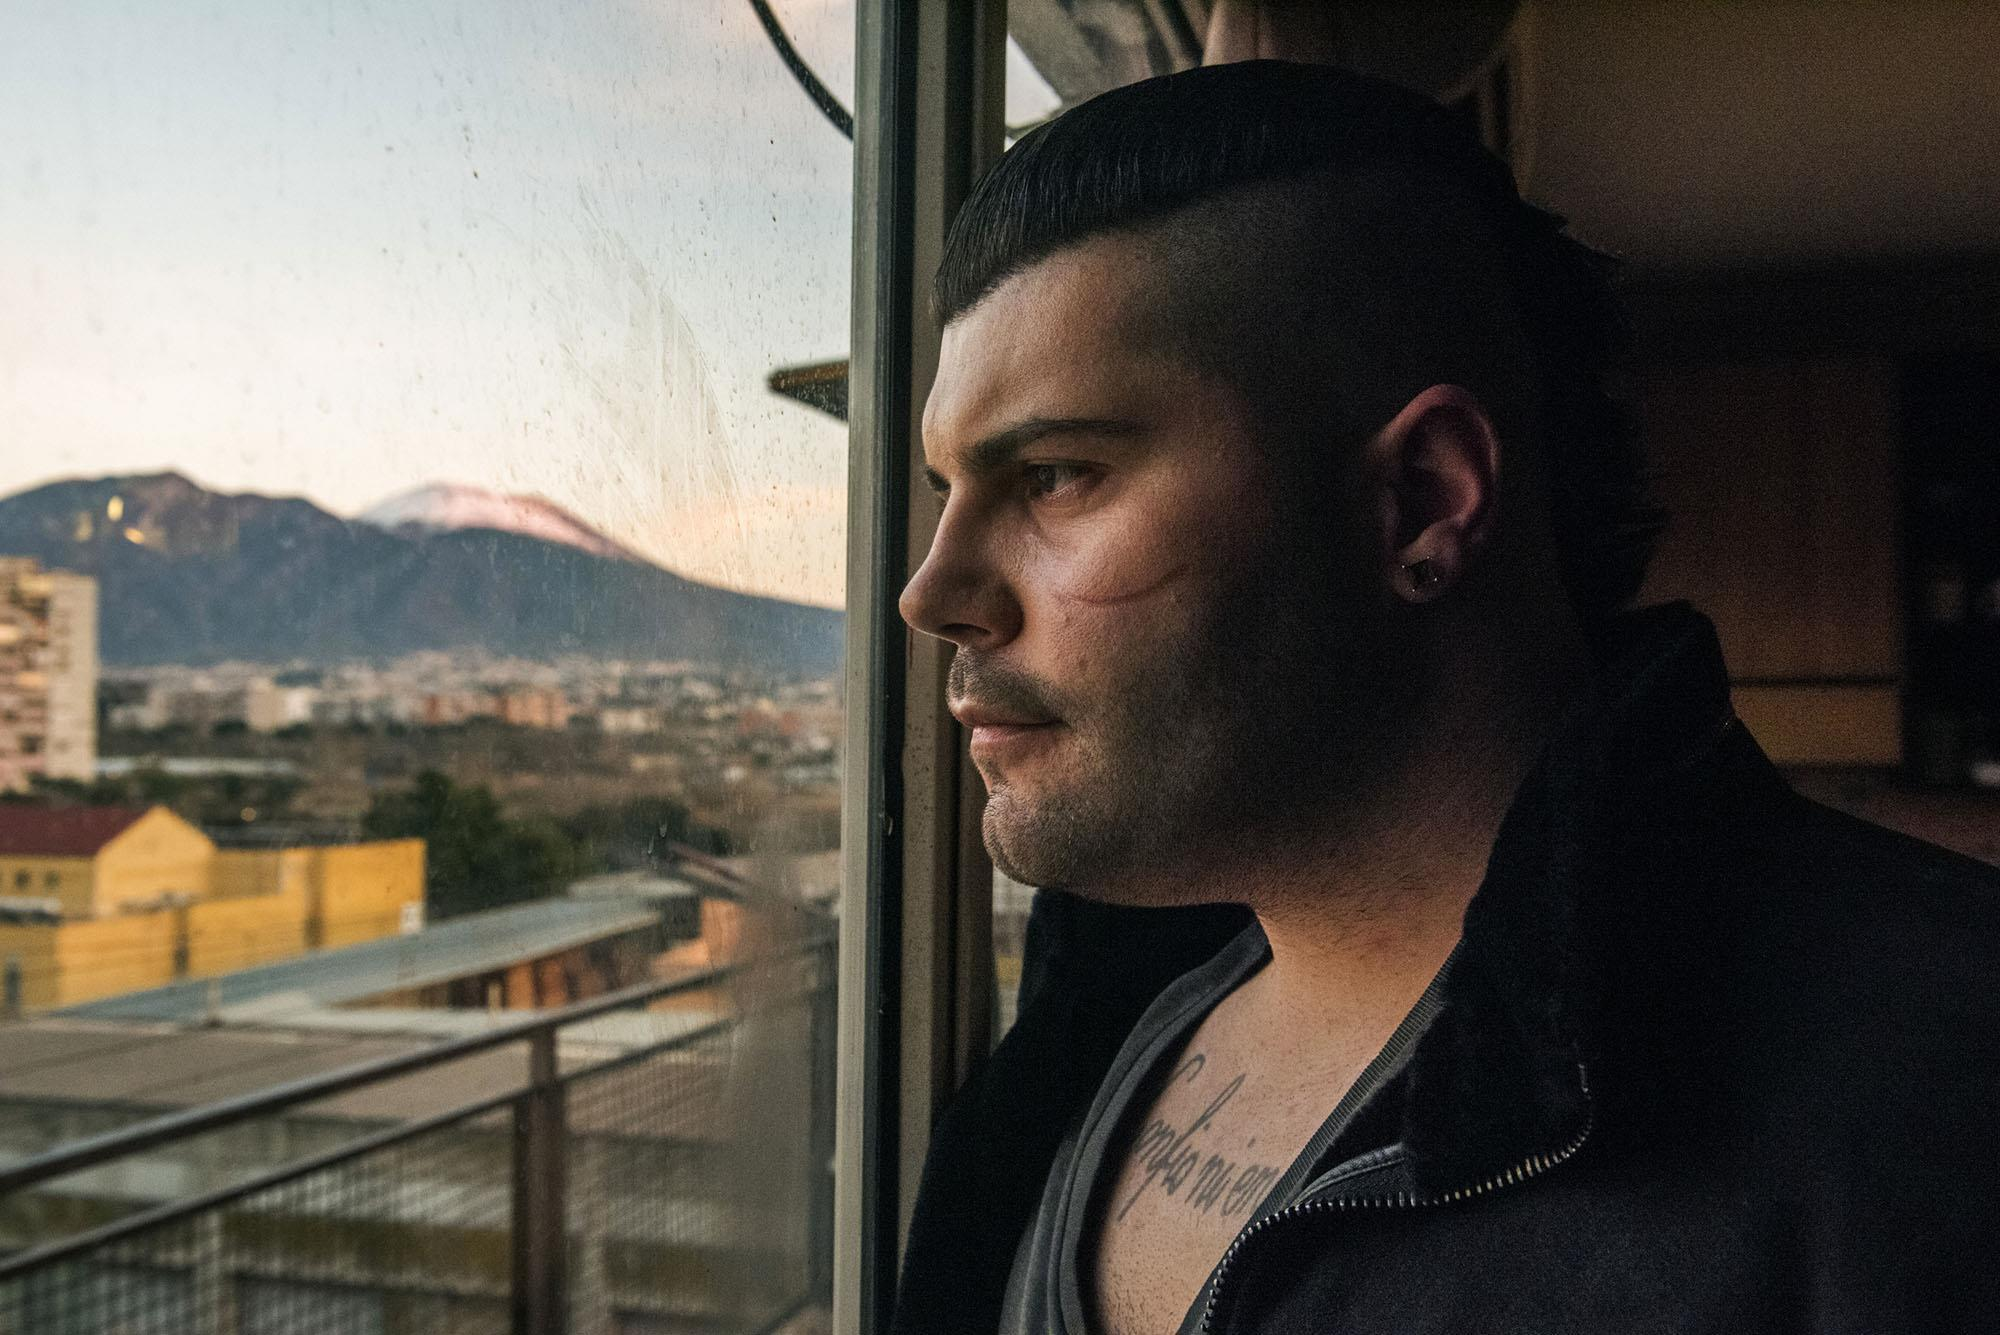 Gomorrah season 3 tops Italian box office after cinema release